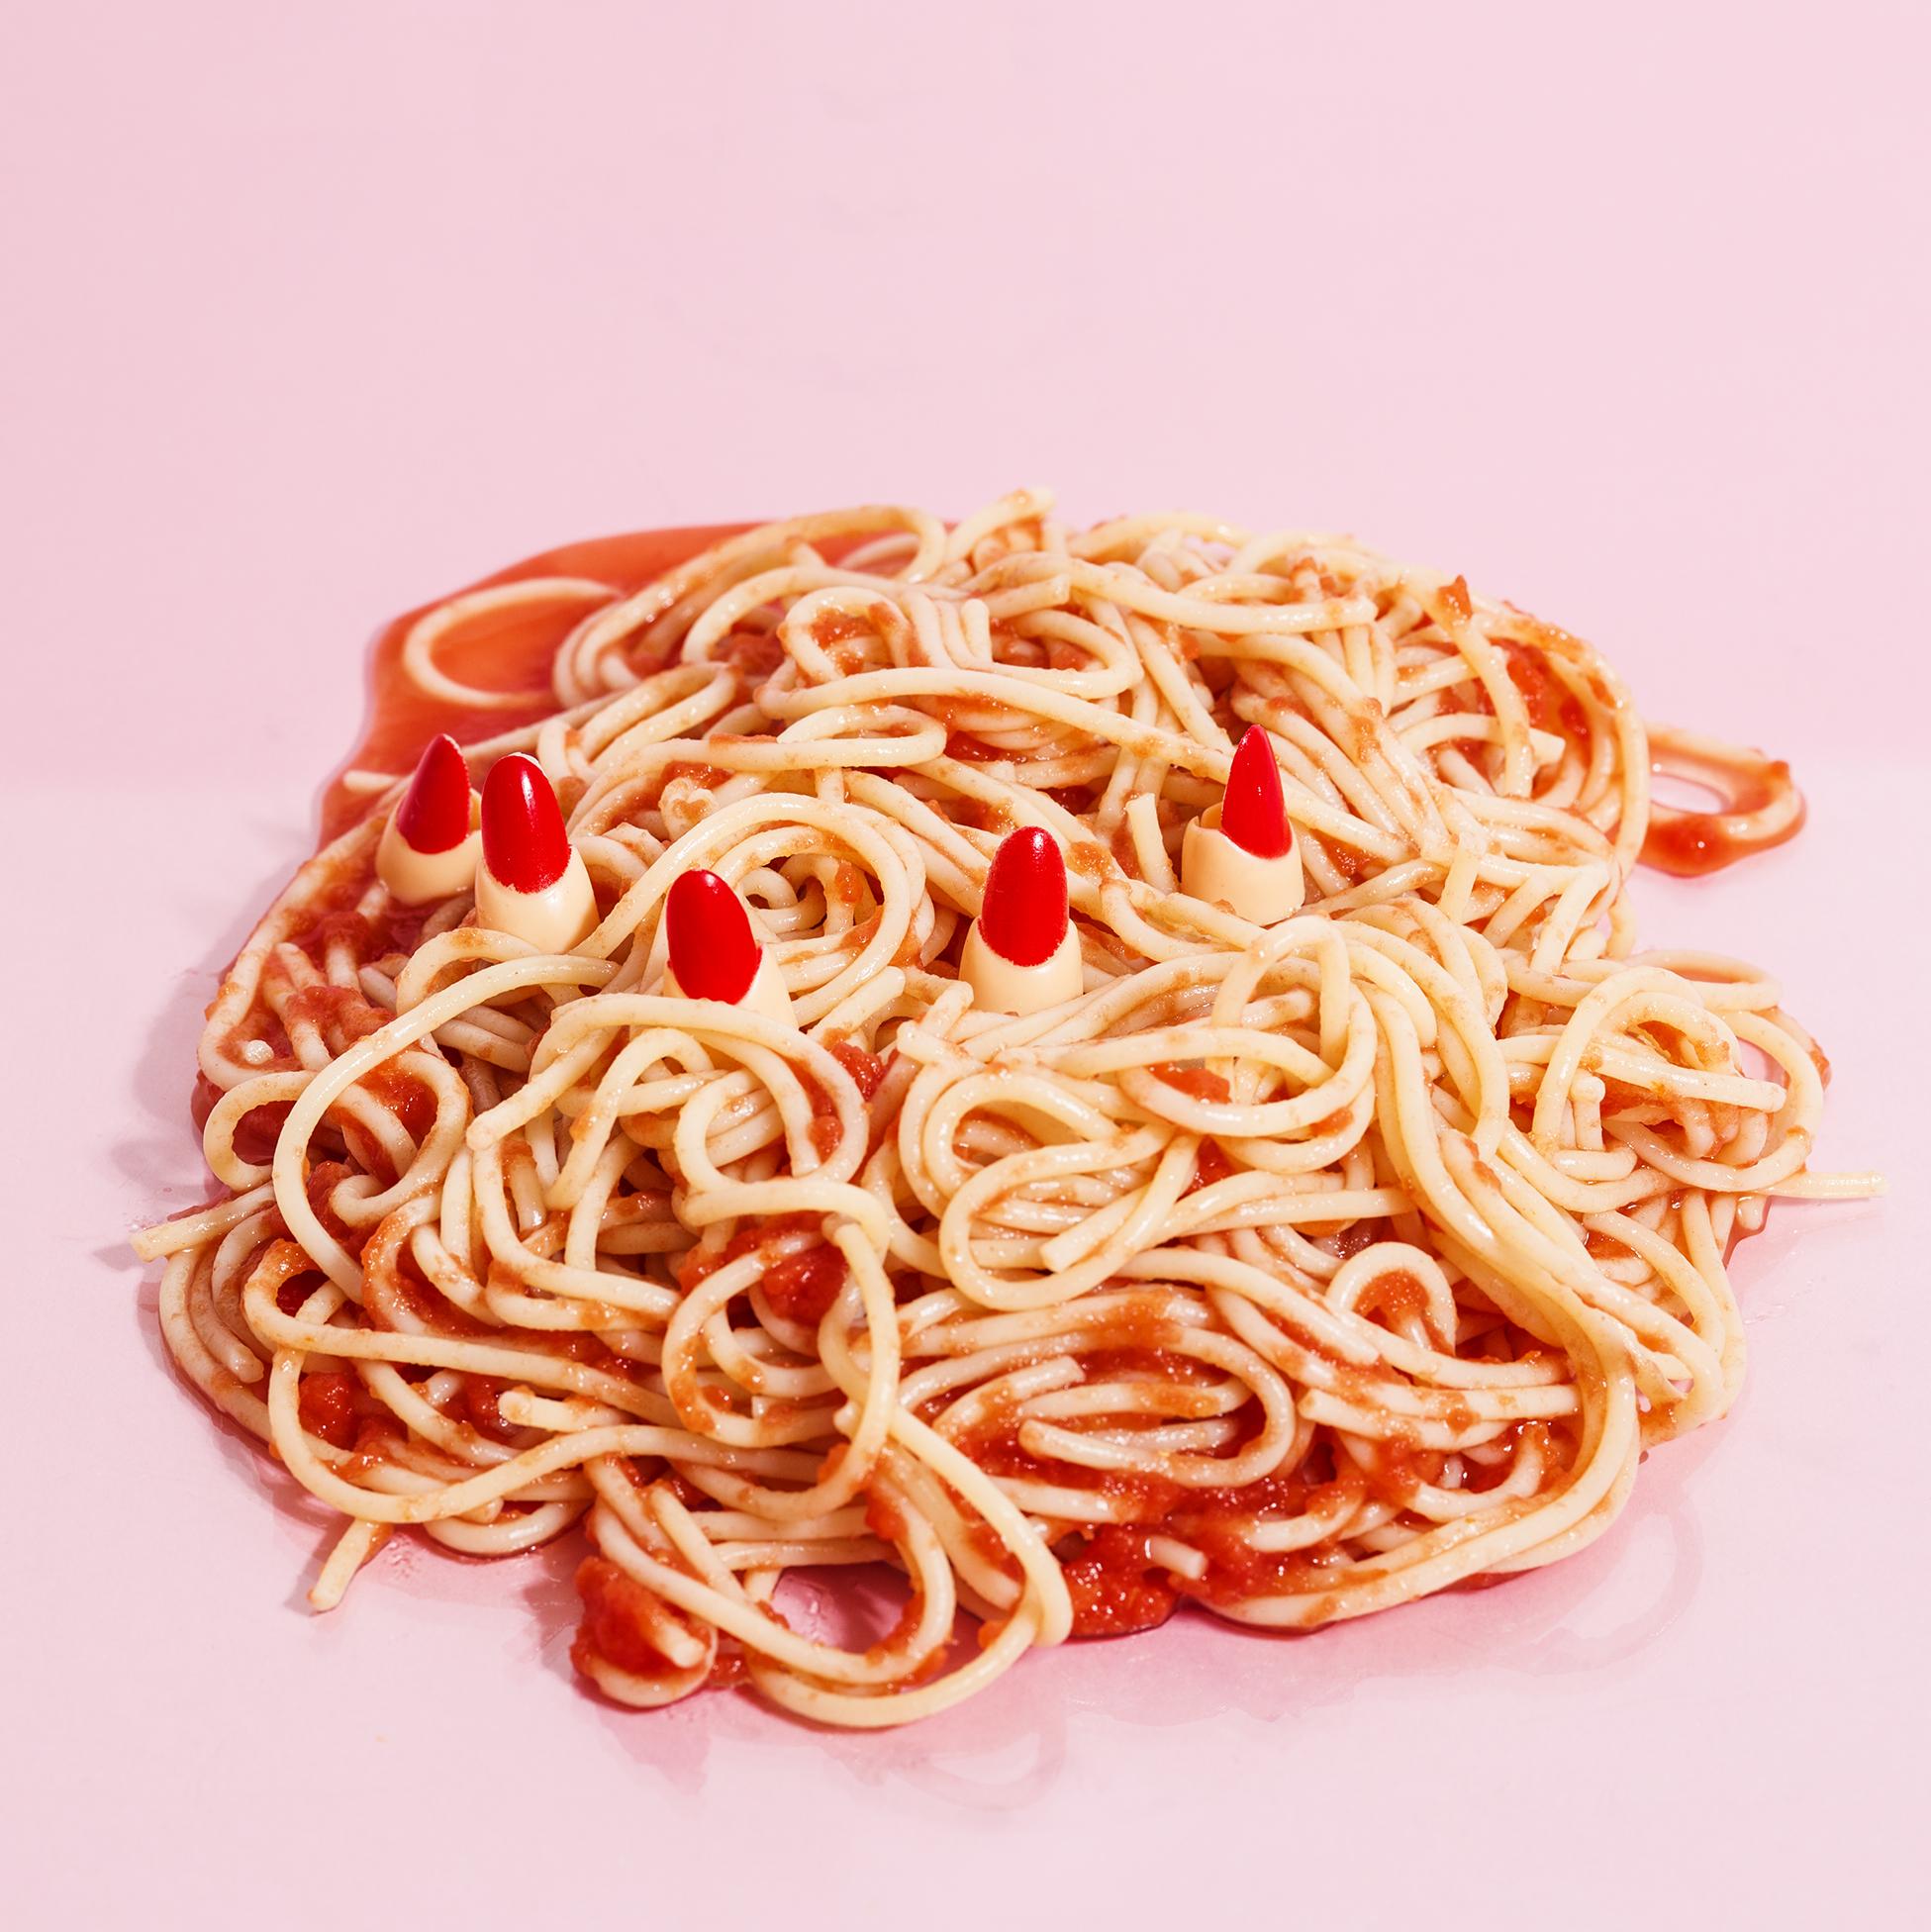 January 4th - Spaghetti Day